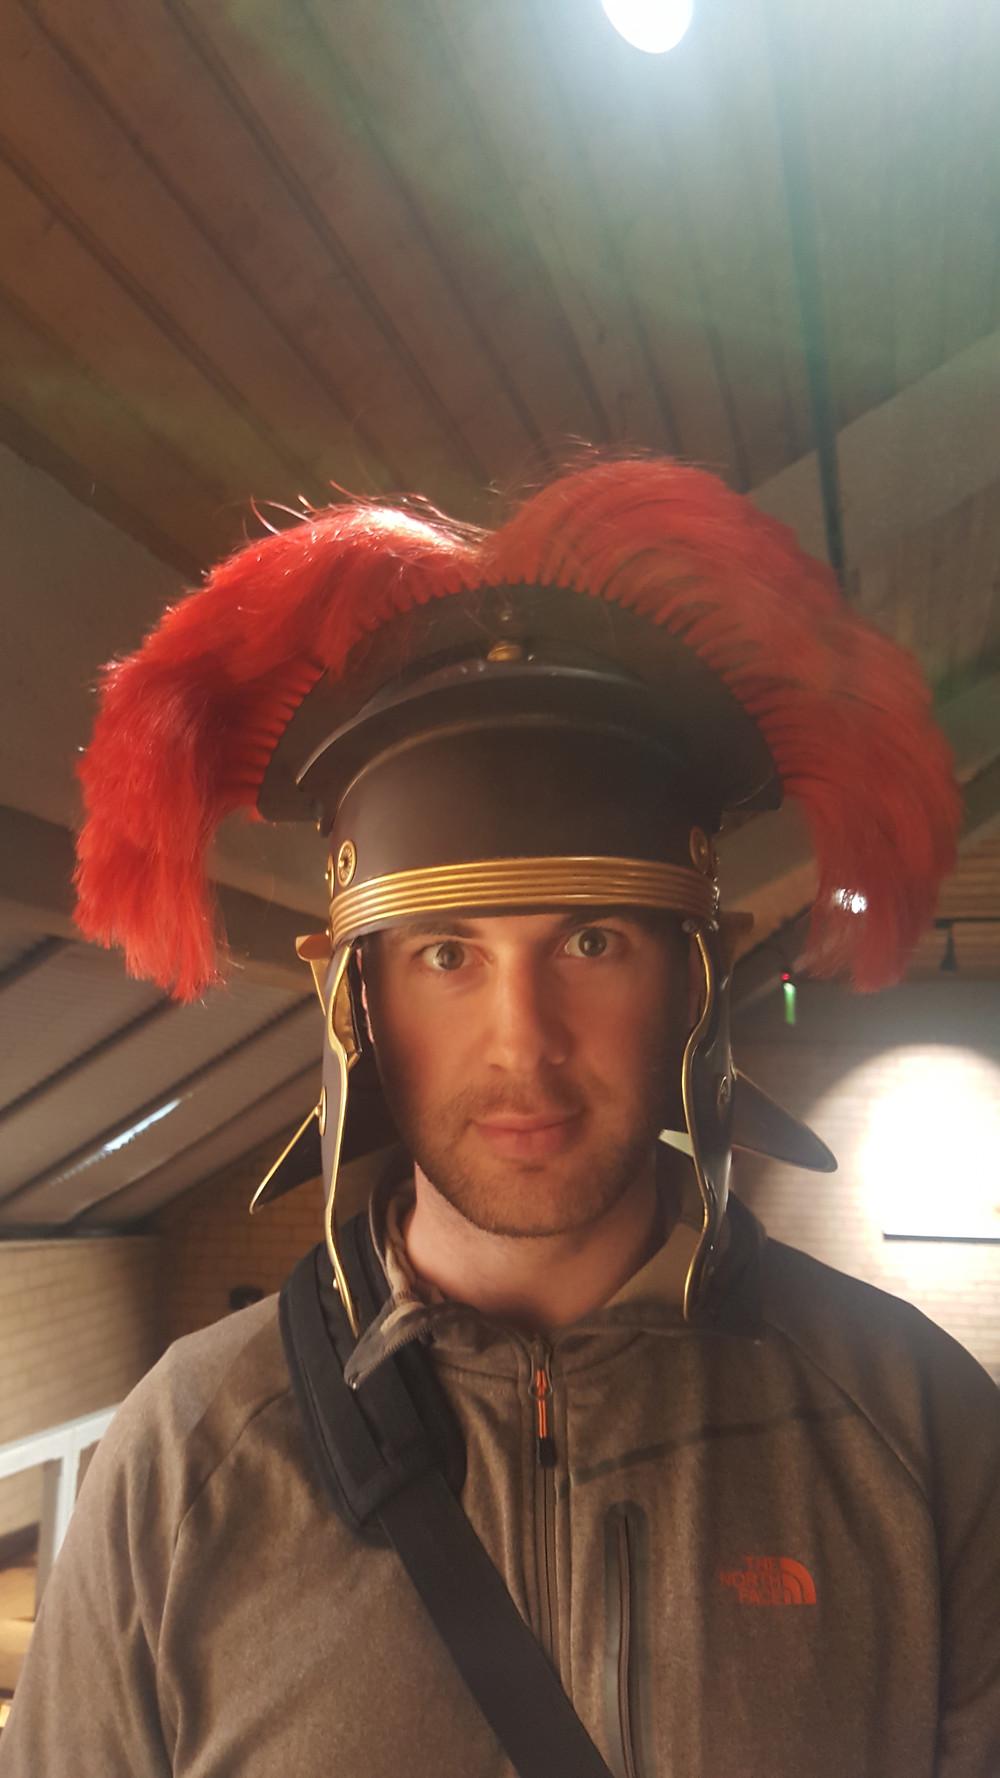 Dean dressing up in a replica roman helmet - New Port, Wales - Life Itinerant